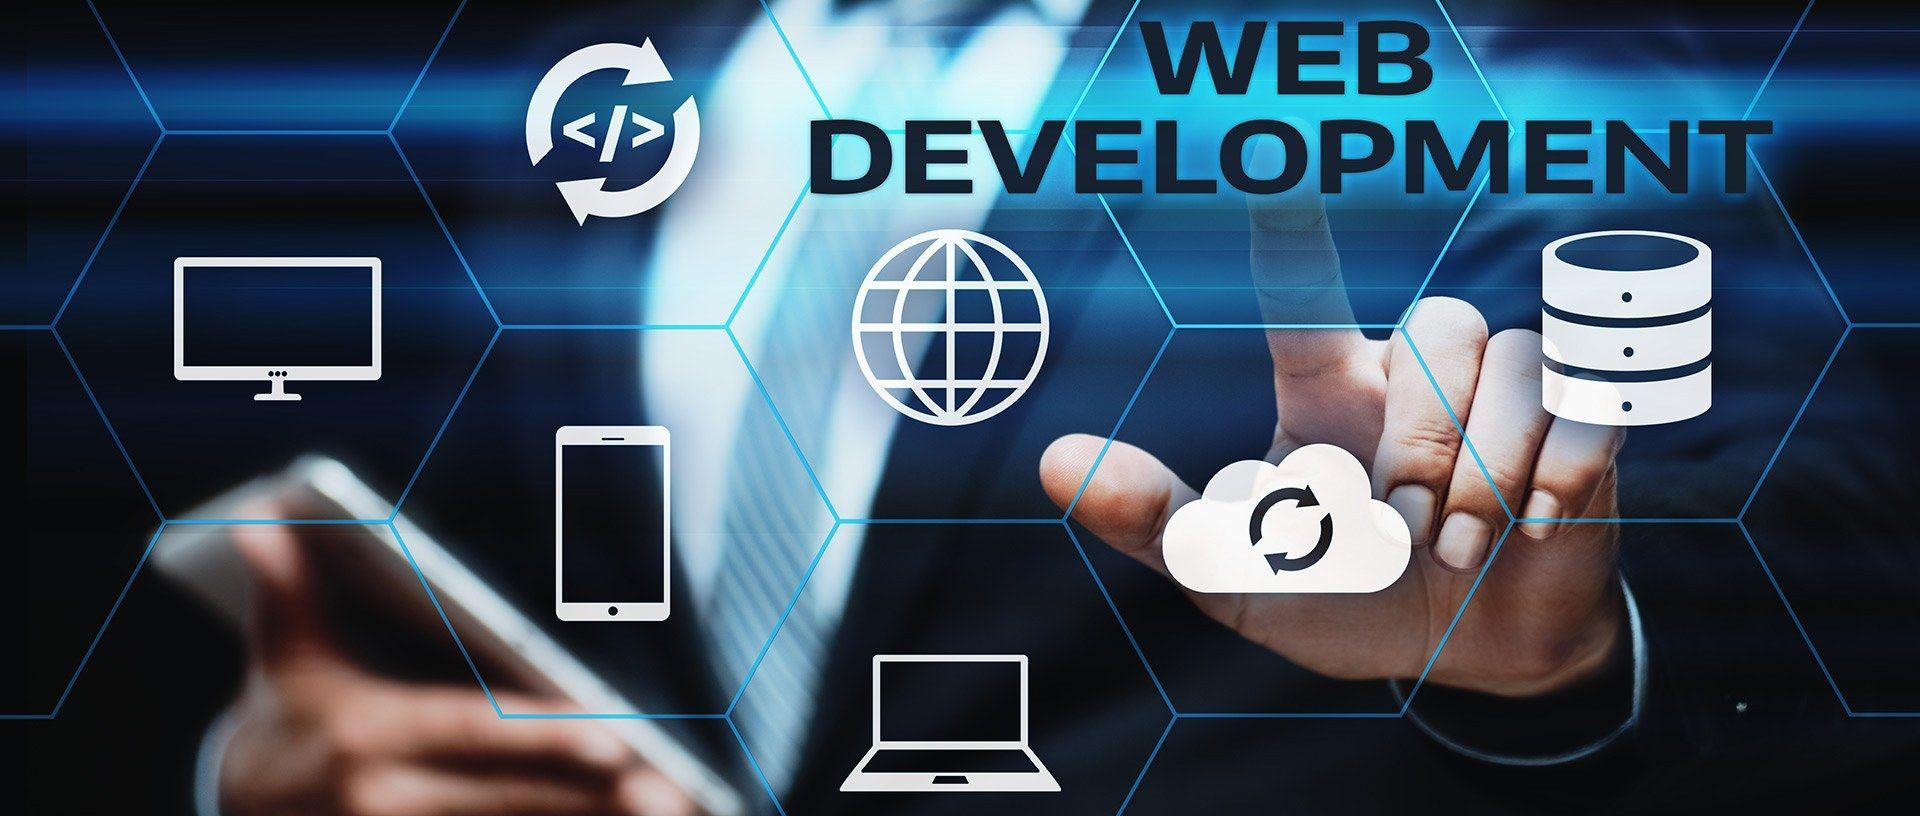 Home In 2020 Web Development App Development Companies Web Design